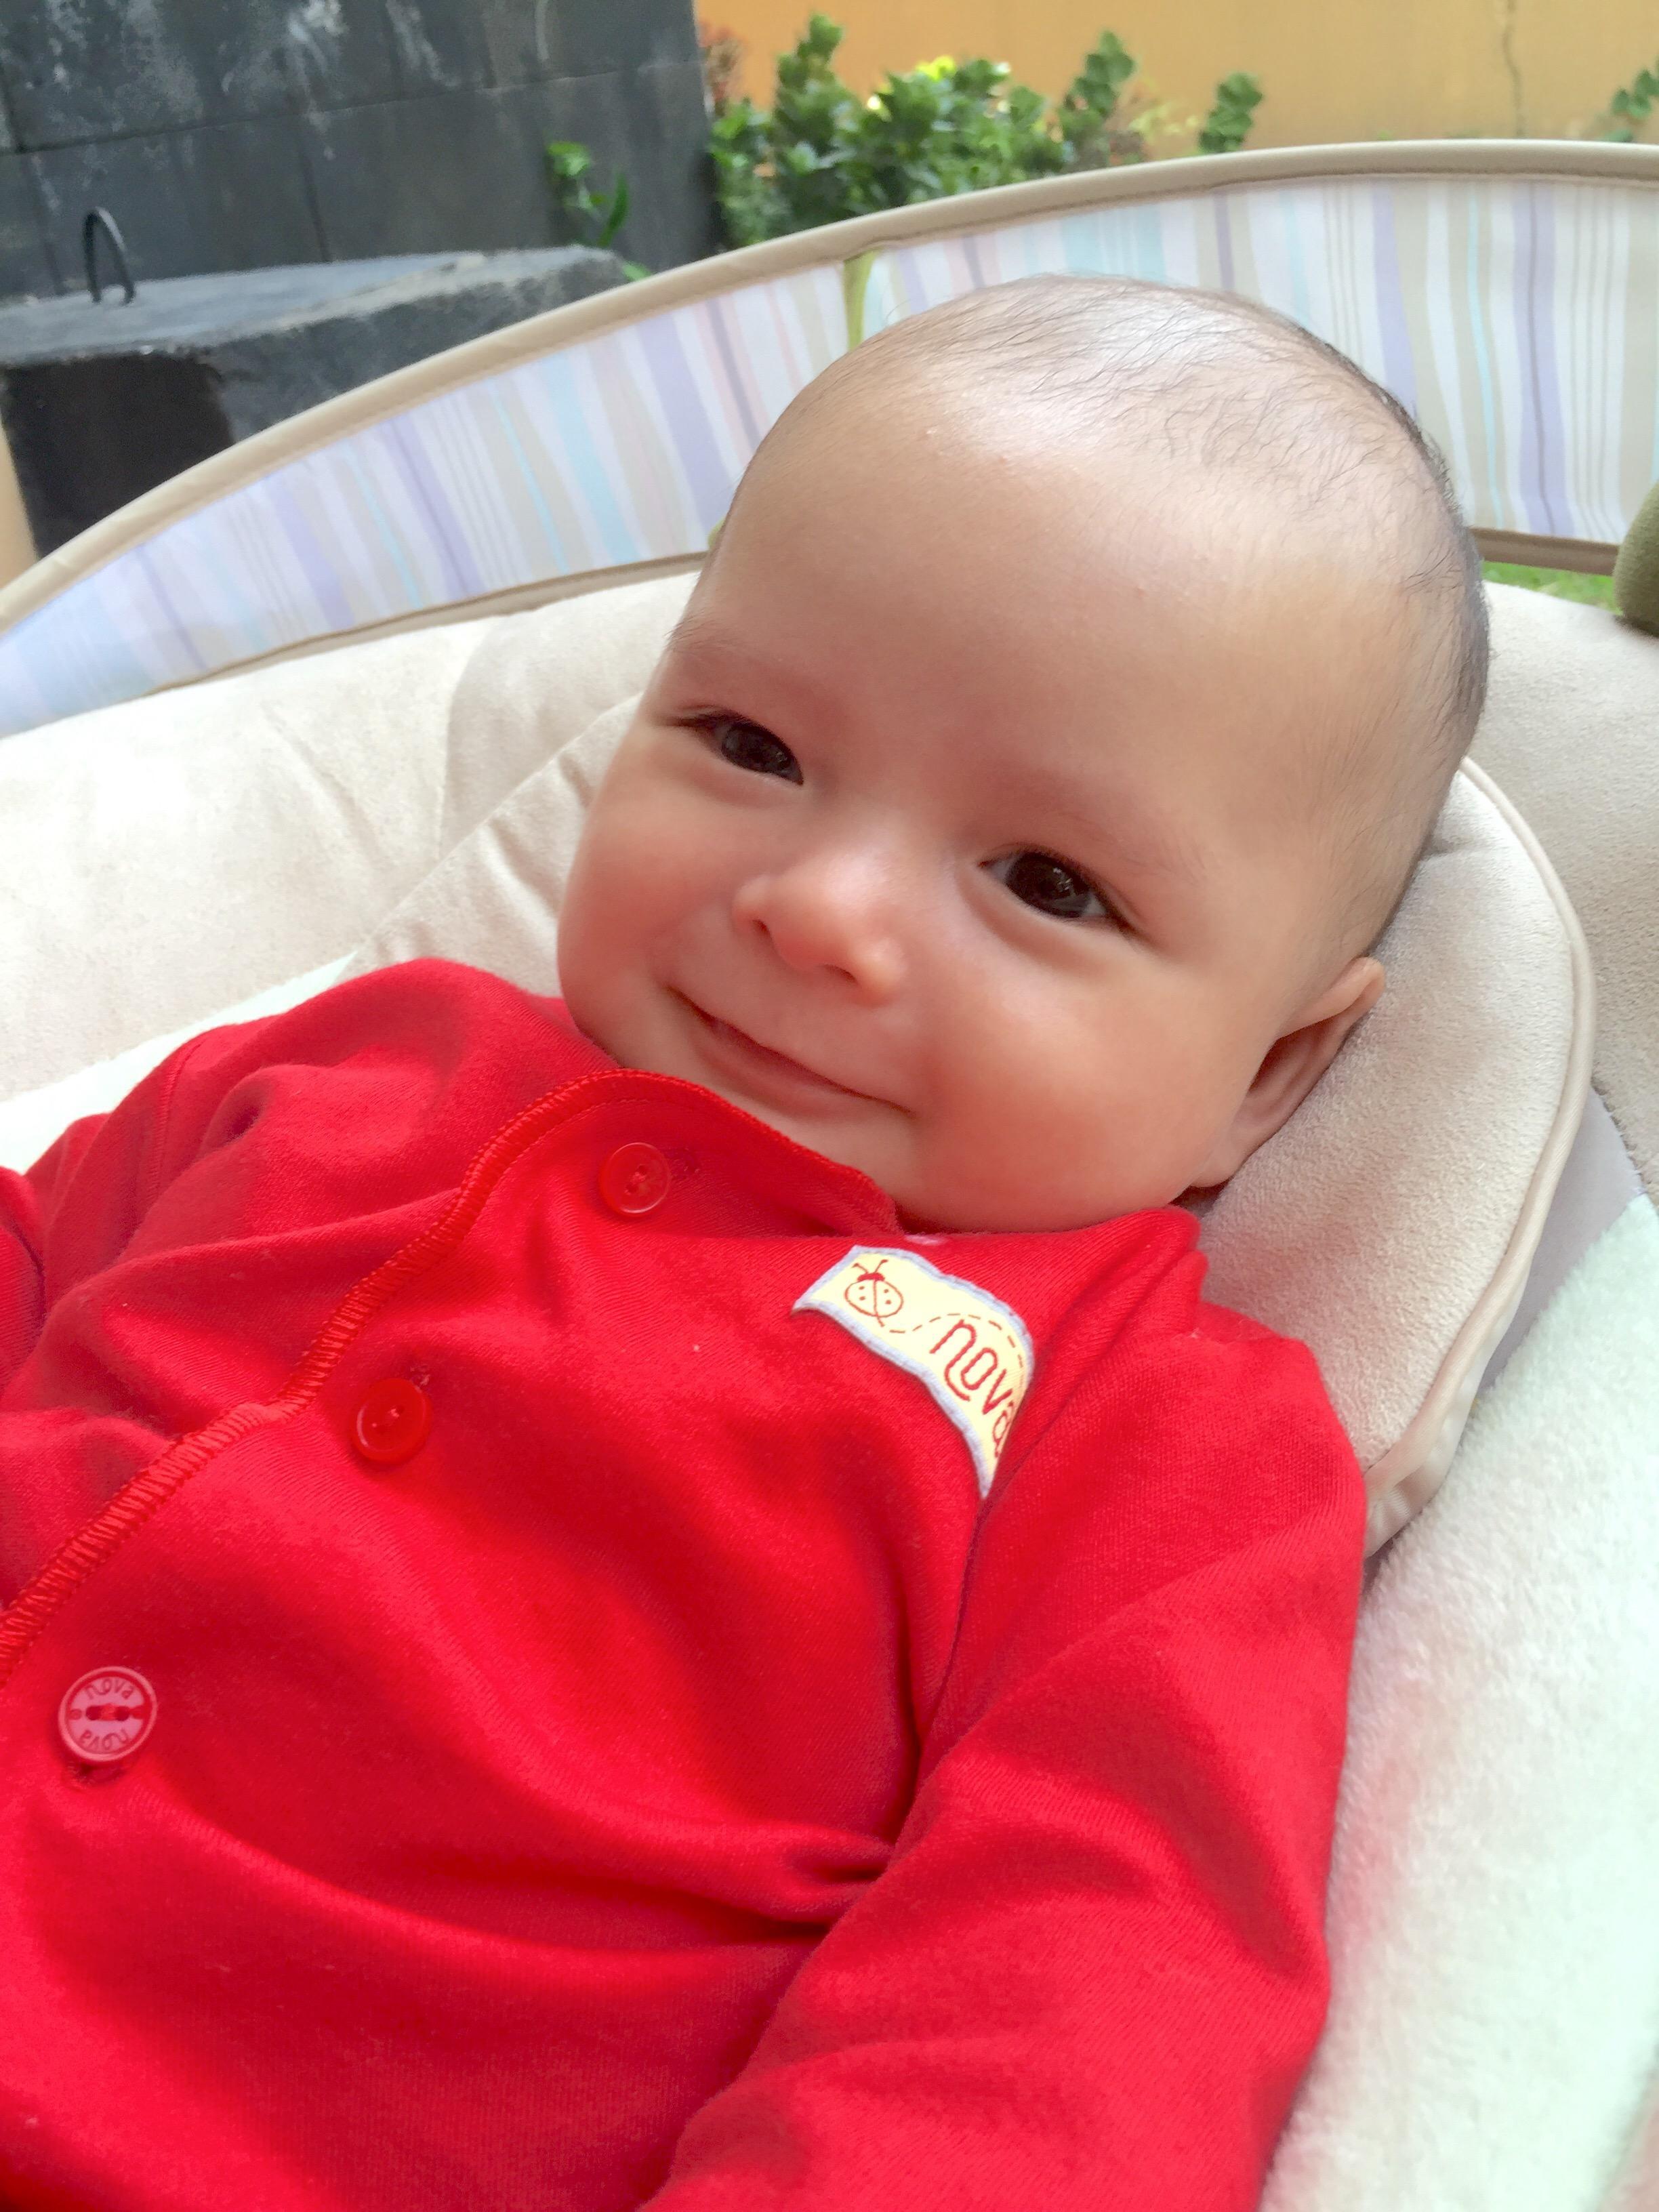 Gambar Anak Bayi Laki2 Lucu Terbaru  Display Picture Update